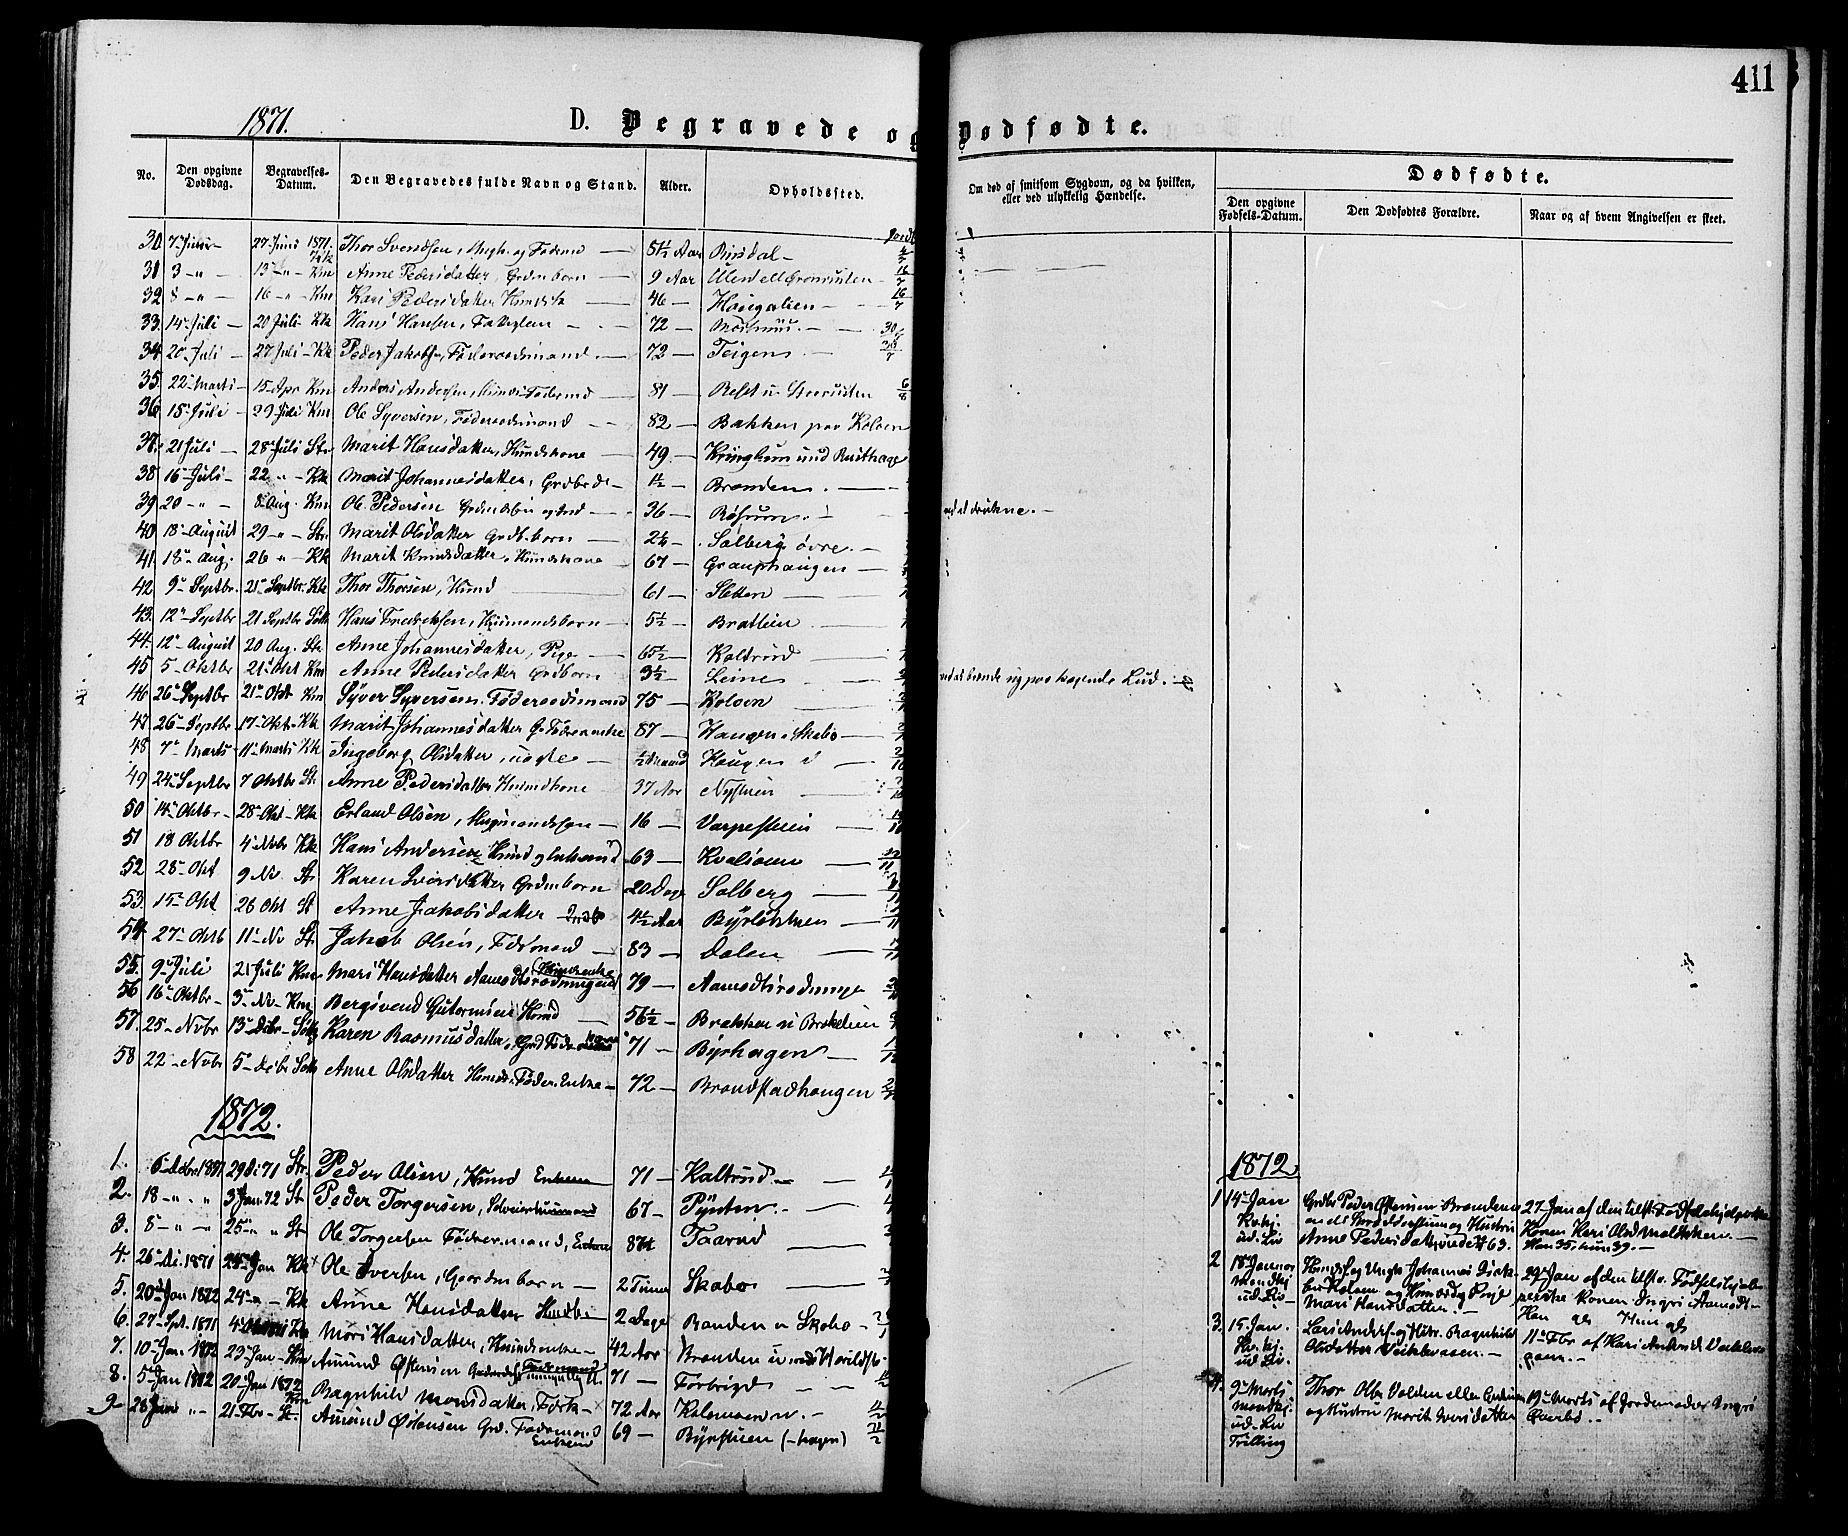 SAH, Nord-Fron prestekontor, Ministerialbok nr. 2, 1865-1883, s. 411